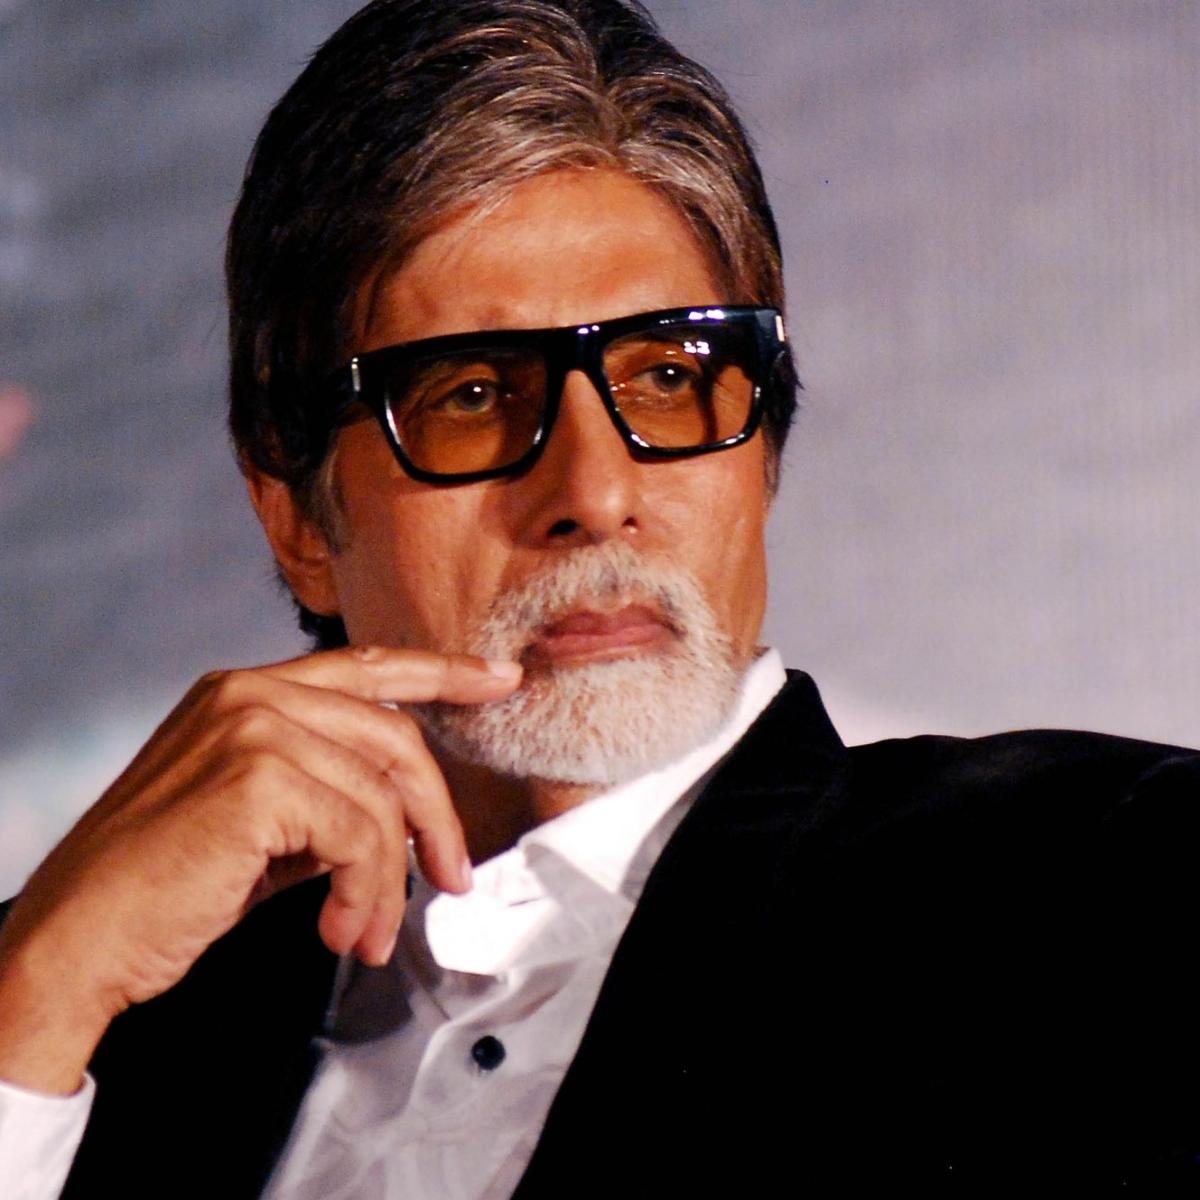 Amitabh Bachchan donates equipment to set up 25-bed COVID facility in Mumbai